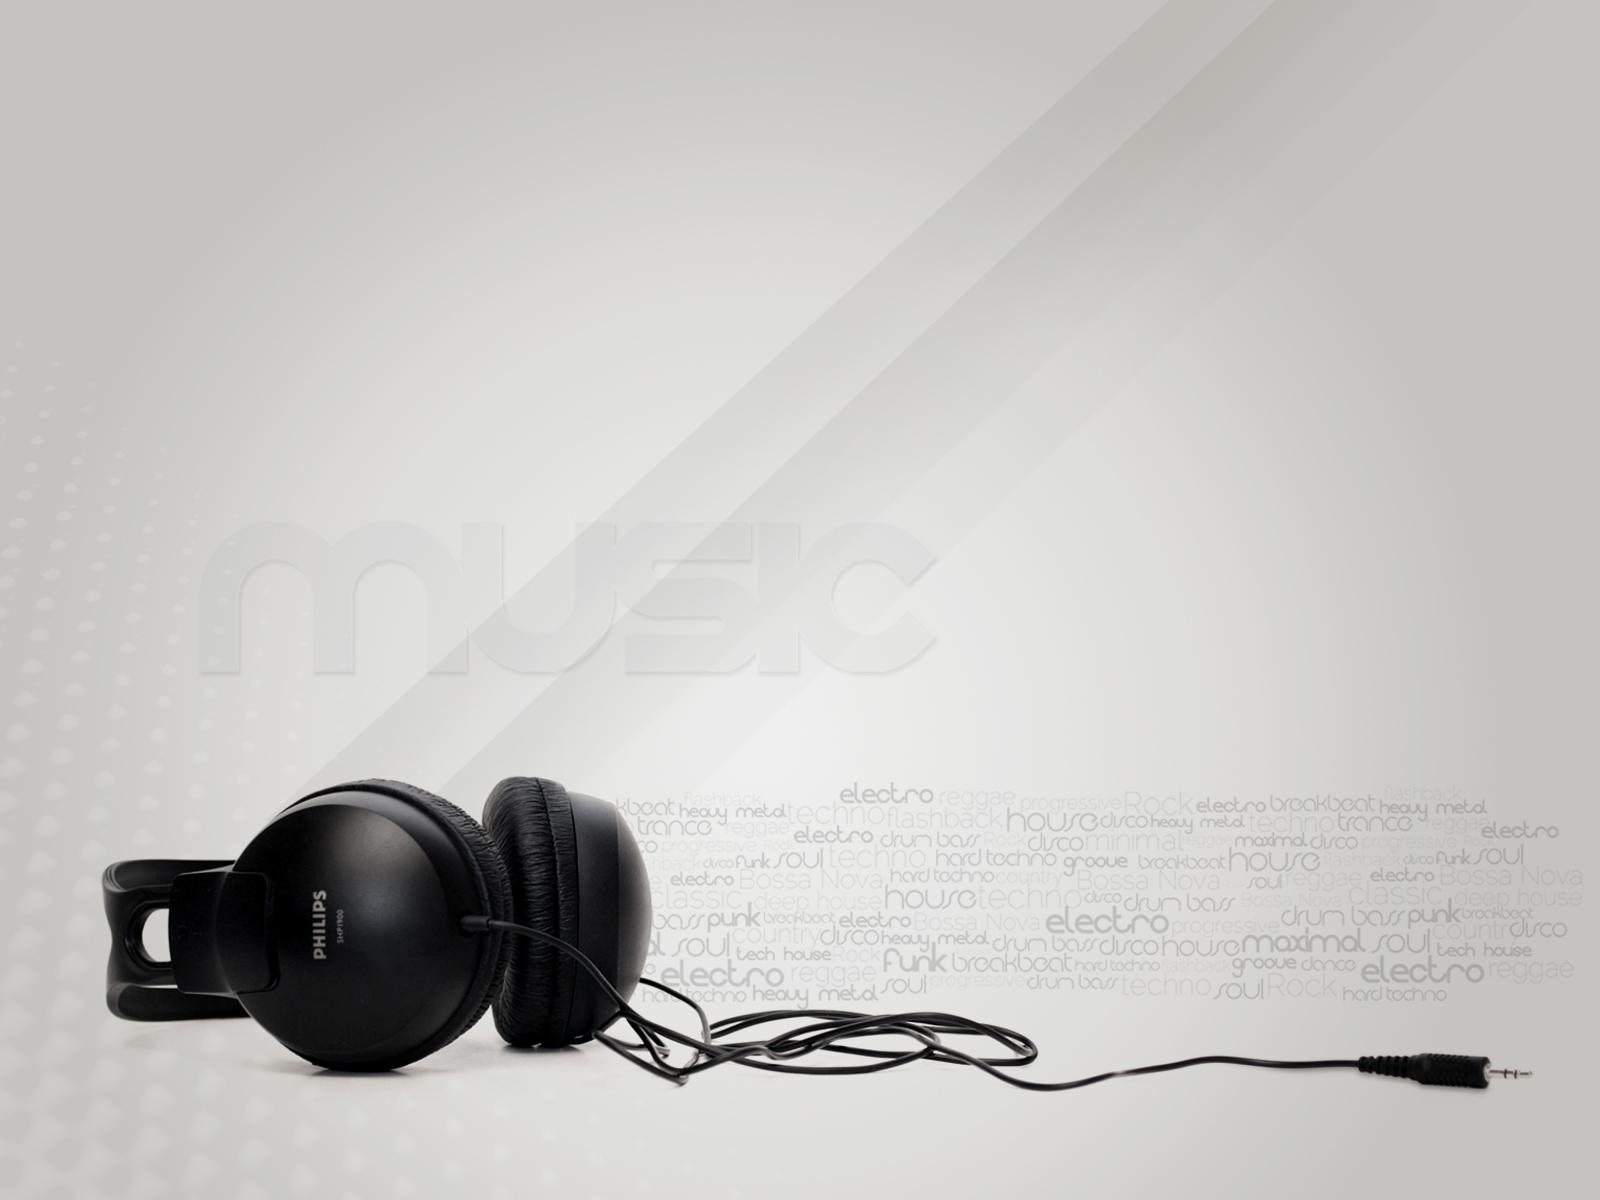 http://1.bp.blogspot.com/-gmZmtYiZzKM/TqB0qe7CIFI/AAAAAAAADEs/XpZKGzqJXF8/s1600/music_wallpaper.jpg